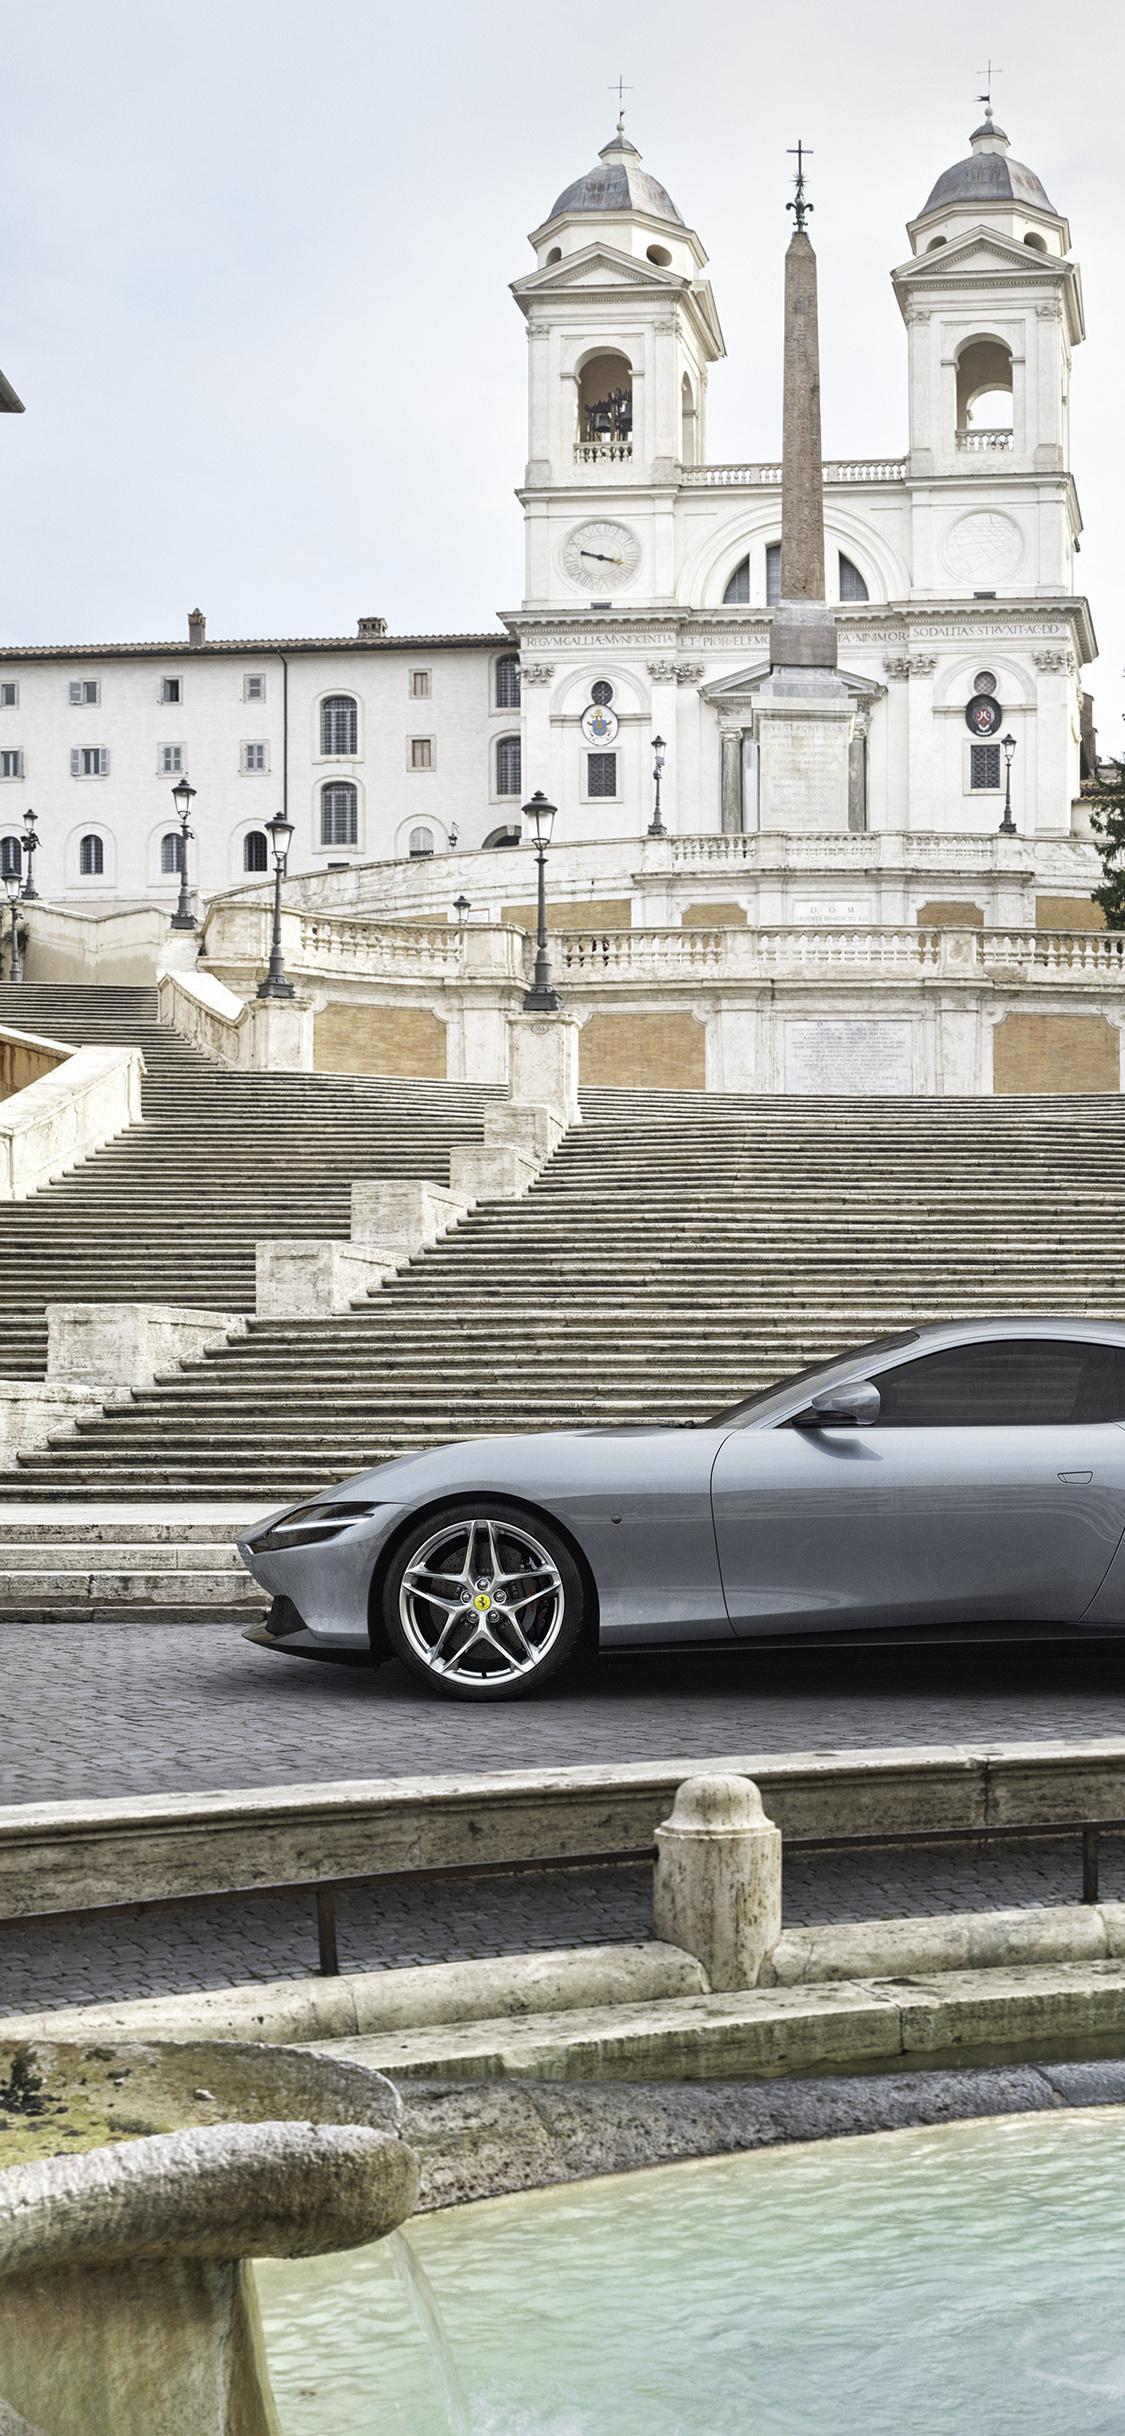 1125x2436 2020 Ferrari Roma 4k Iphone Xsiphone 10iphone X